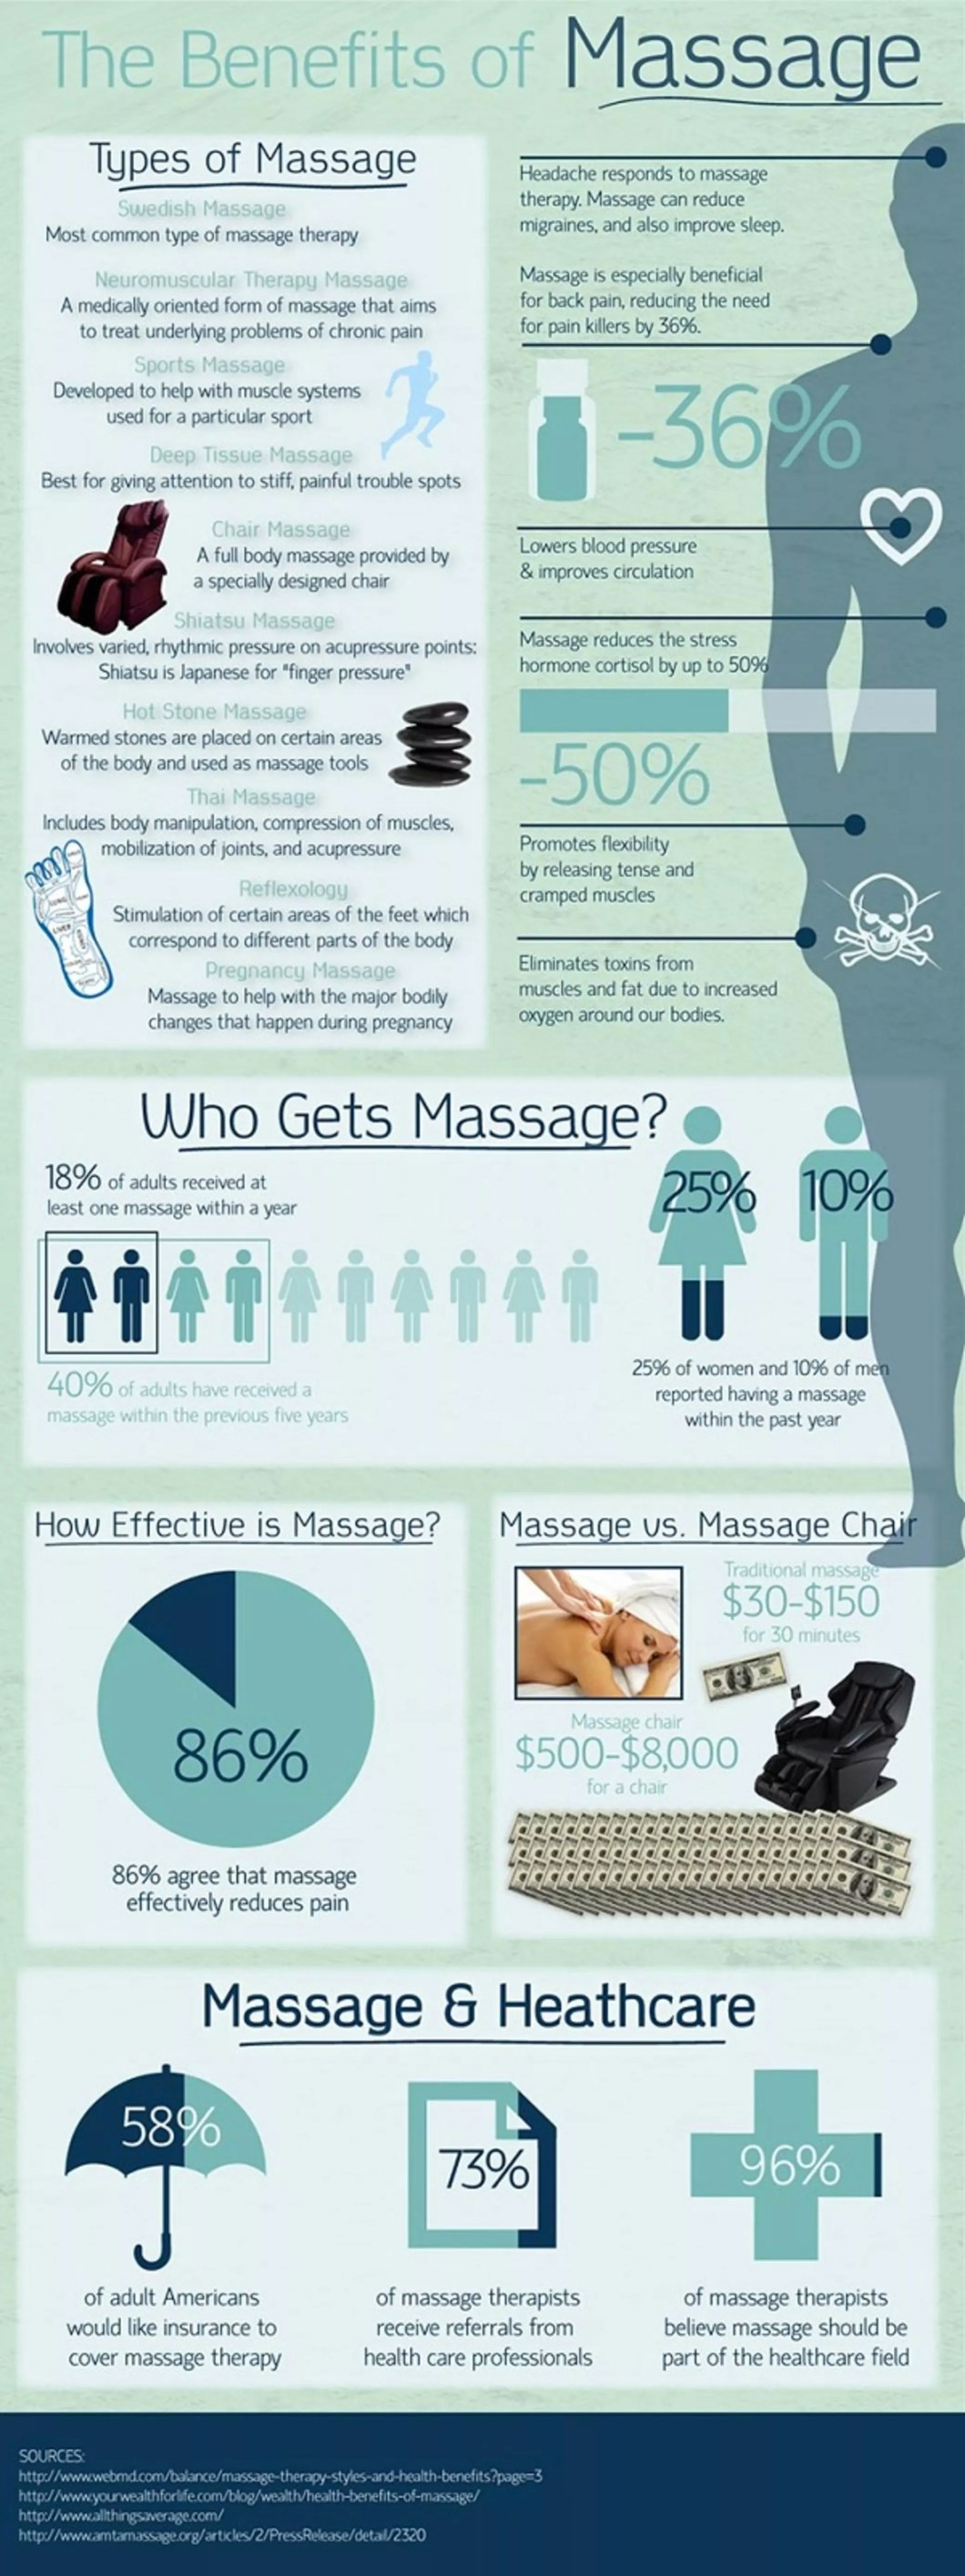 Massage: Medicine or Pleasure? - Infographic